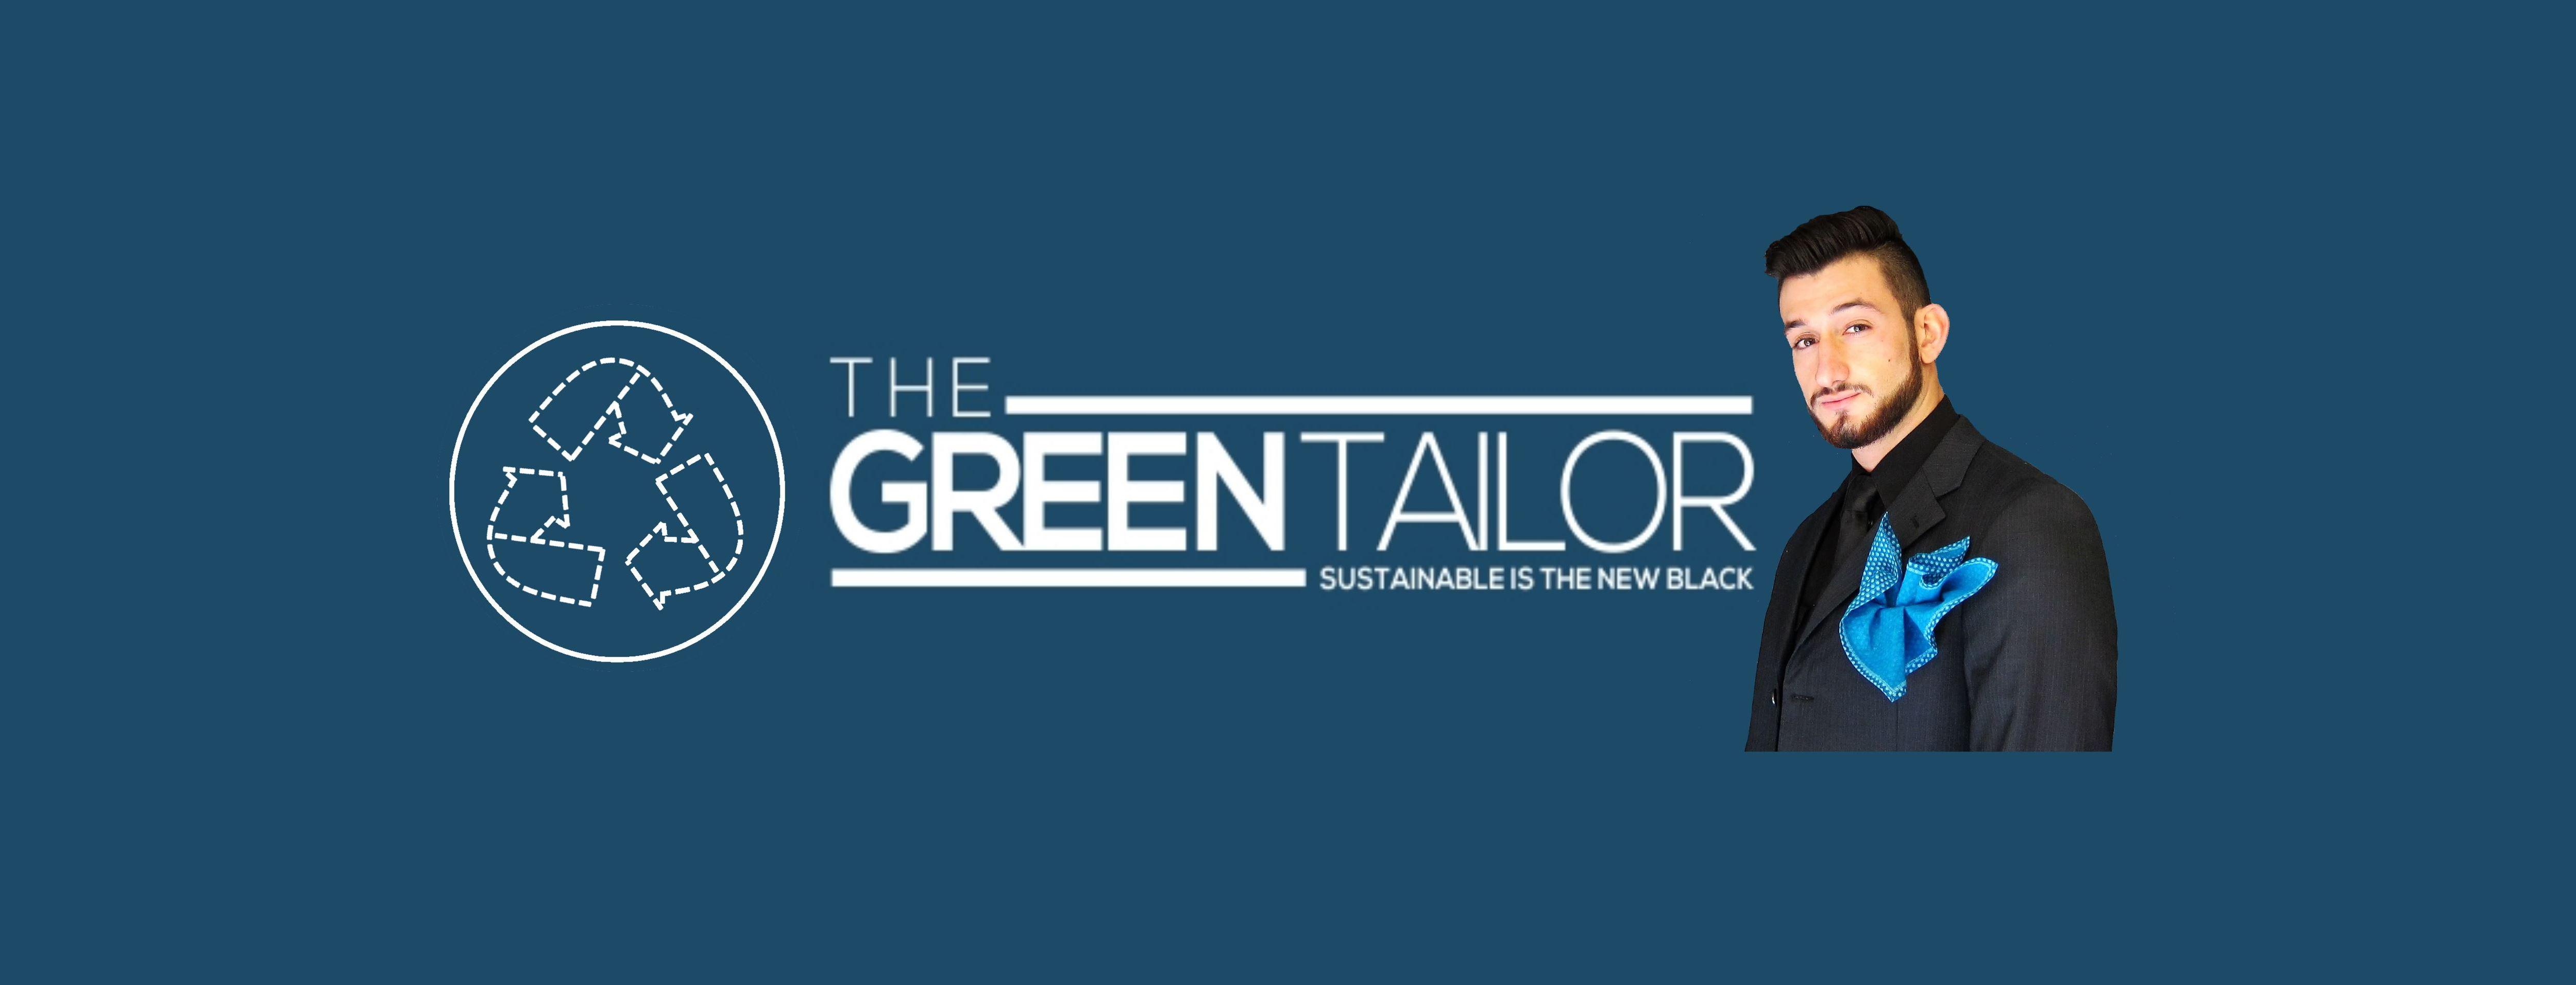 GreenTailorSign